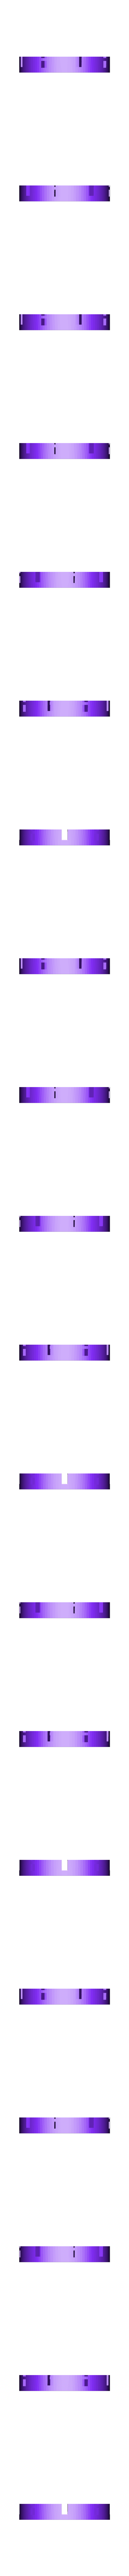 Mount_Planter_Part_2.stl Download free STL file Levitating Planter • 3D print design, Ananords